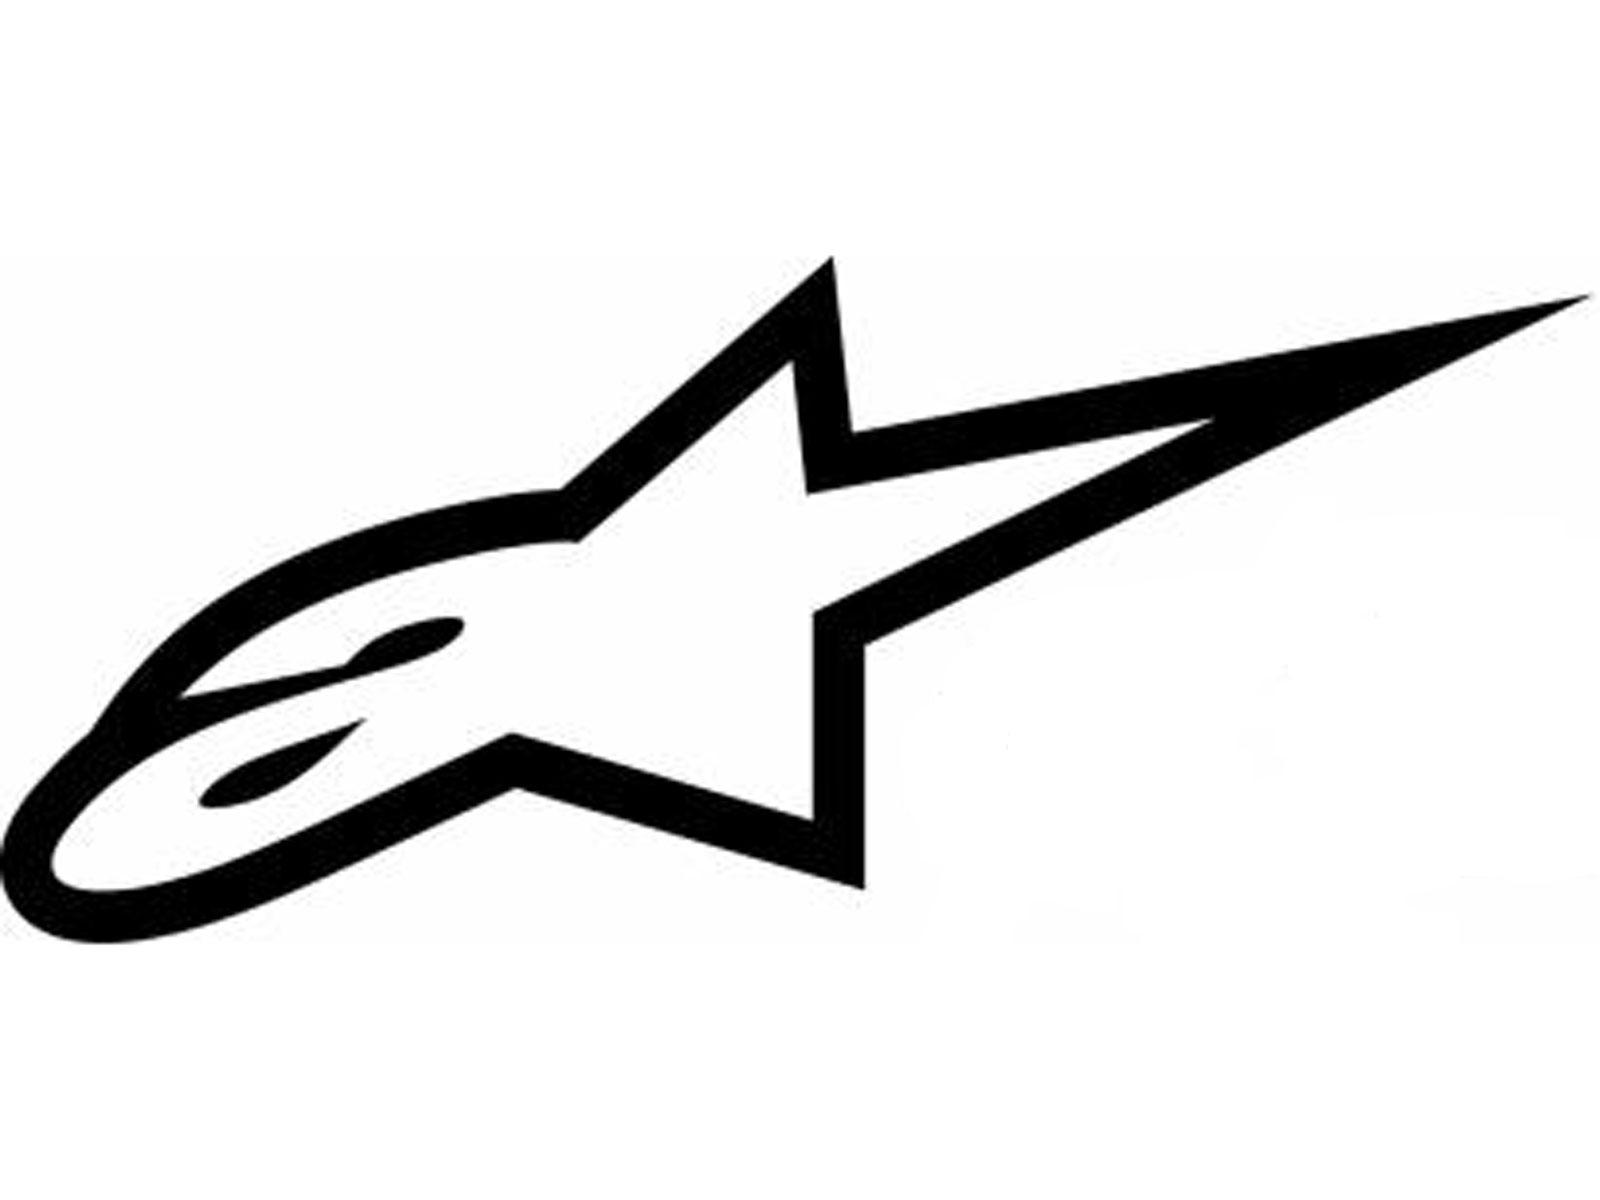 Alpinestar Logo Wallpaper 146 1203 01 zalpinestars 1600x1200